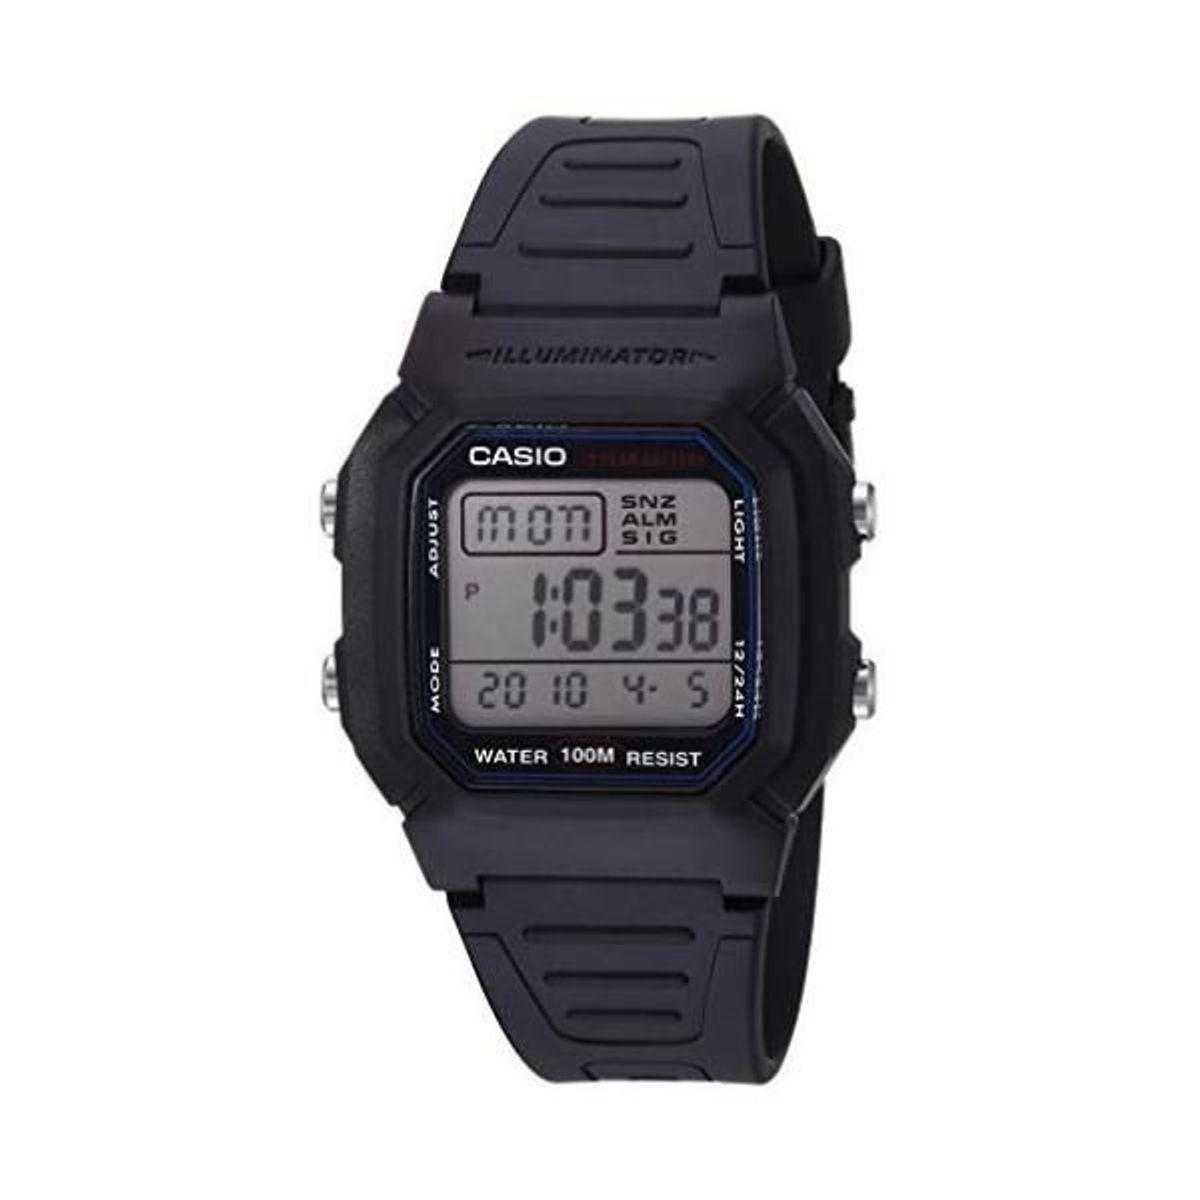 98a6fb9b2cc Relógio Casio Illuminator W-800h-1av - Original